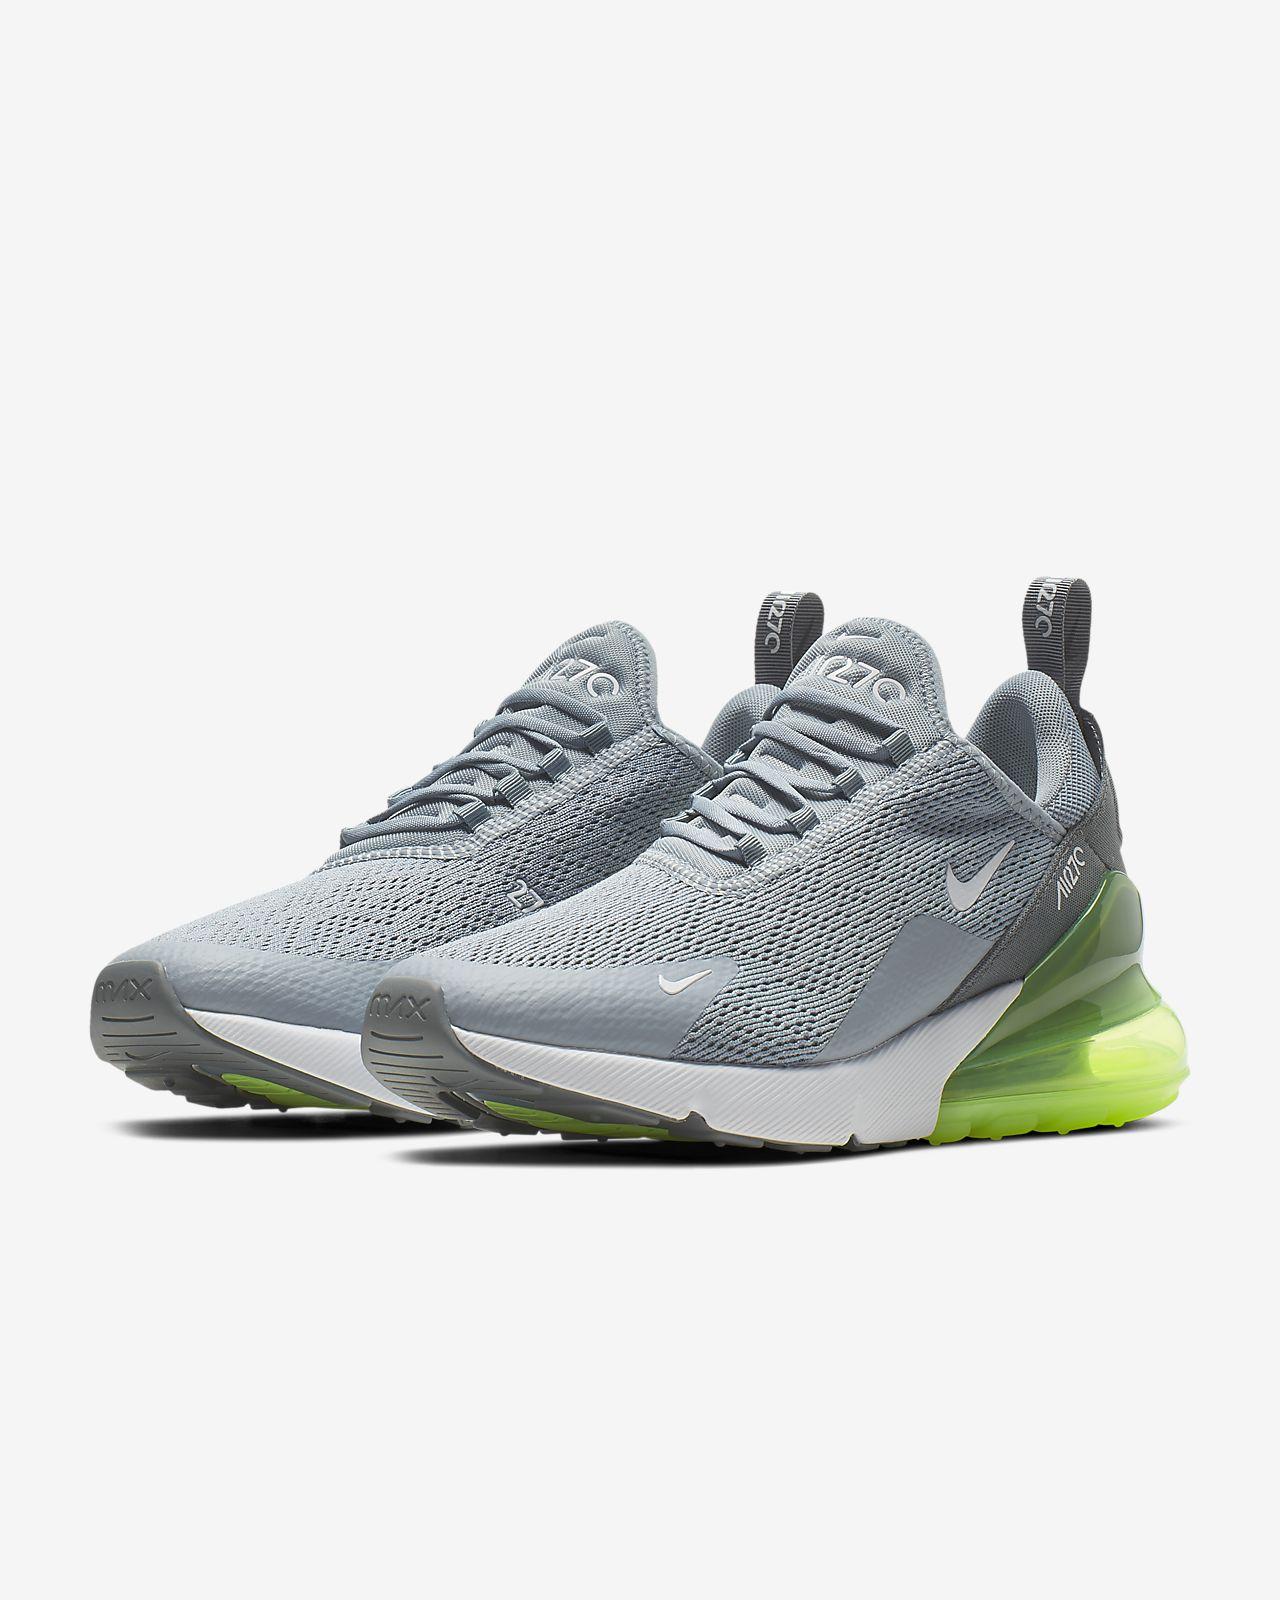 separation shoes ca841 282ab ... Nike Air Max 270 Women s Shoe